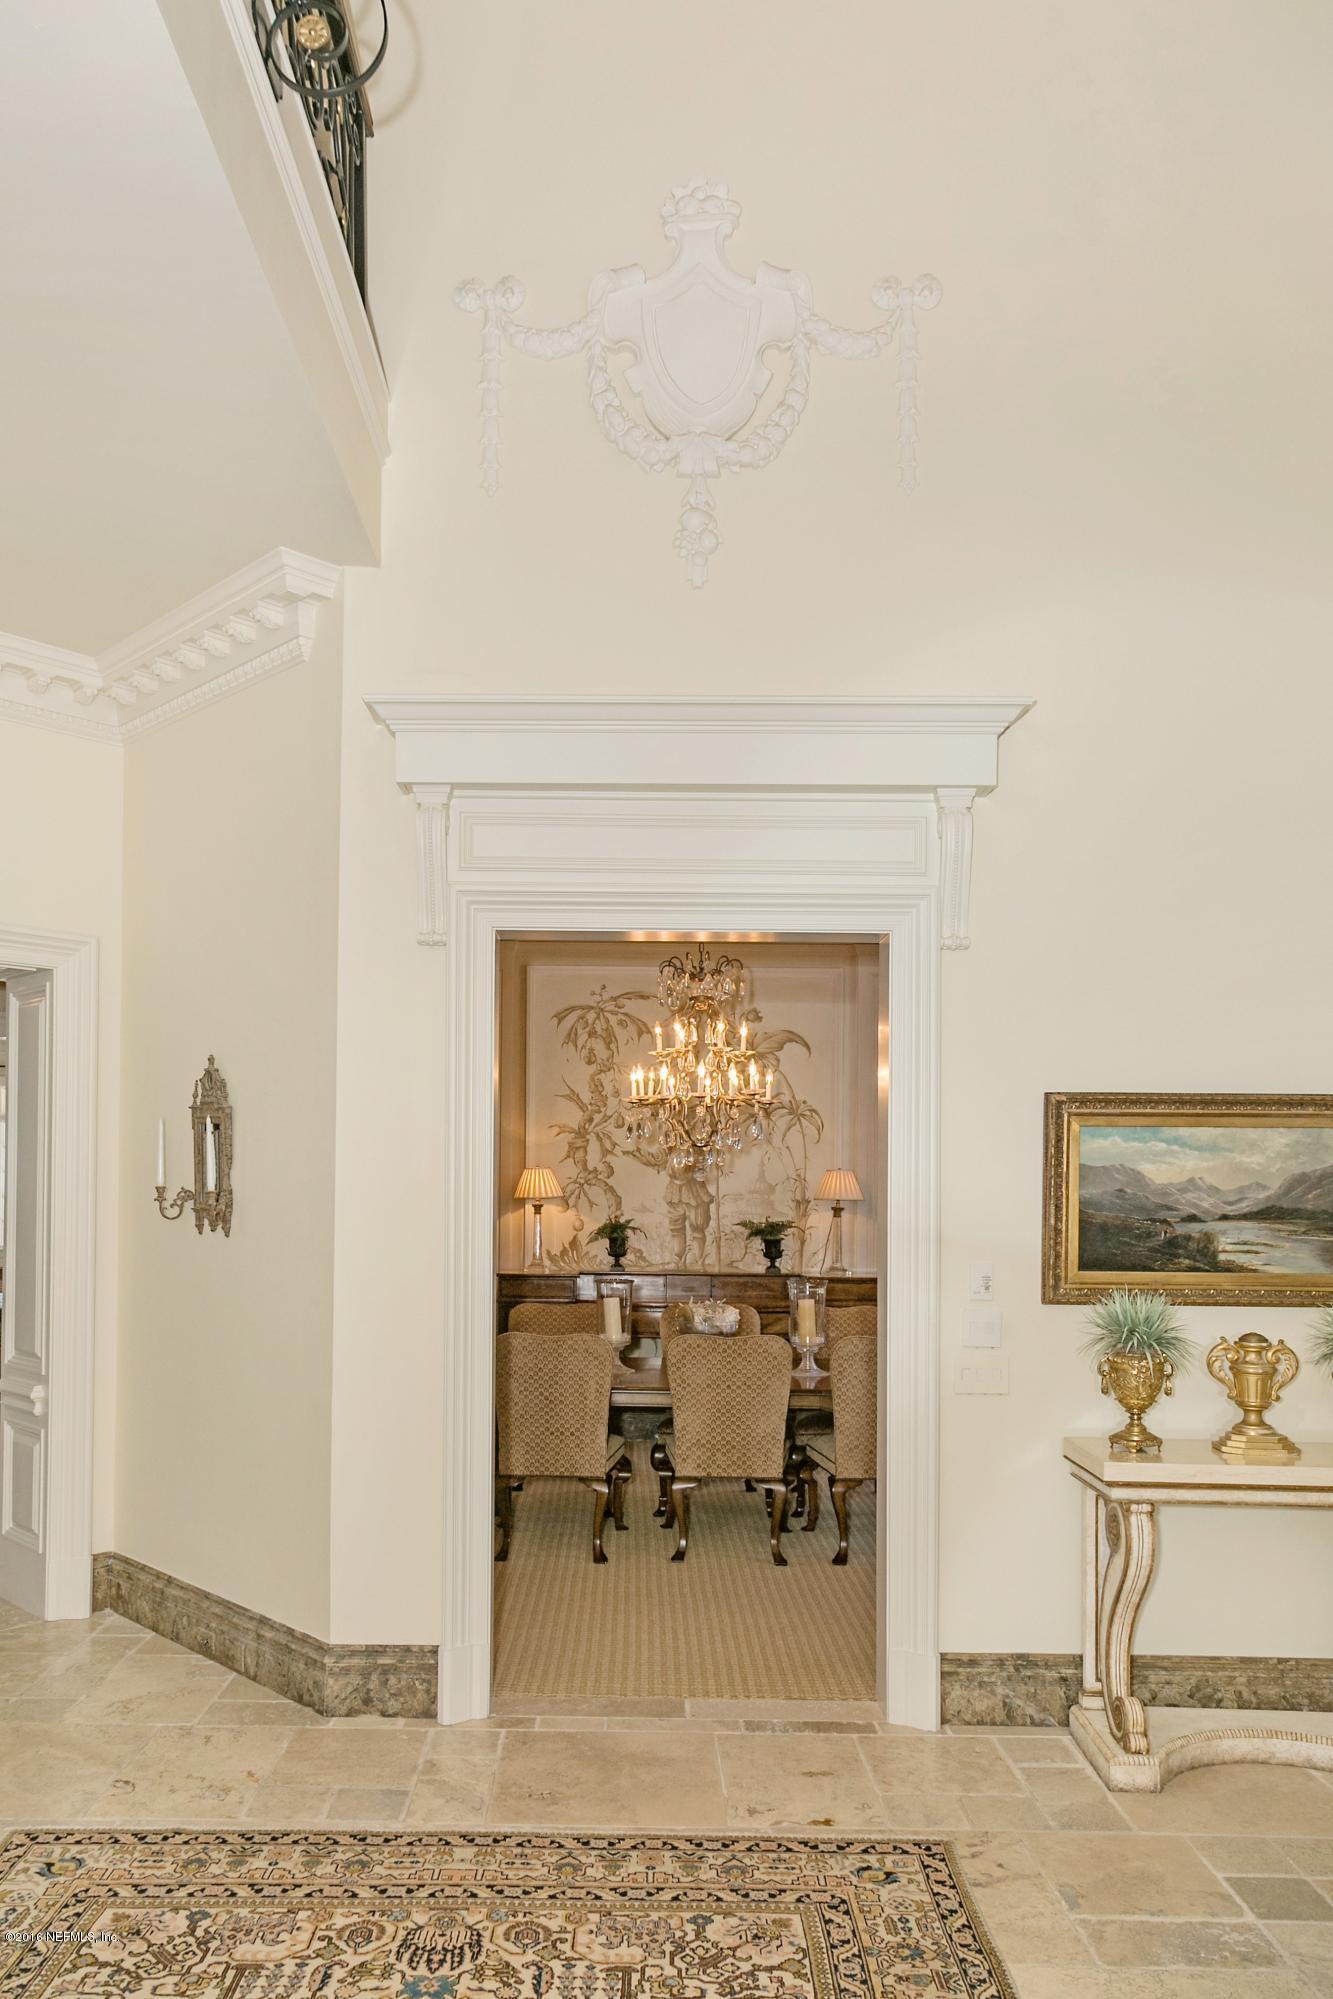 1205 PONTE VEDRA, PONTE VEDRA BEACH, FLORIDA 32082, 6 Bedrooms Bedrooms, ,7 BathroomsBathrooms,Residential - single family,For sale,PONTE VEDRA,811677